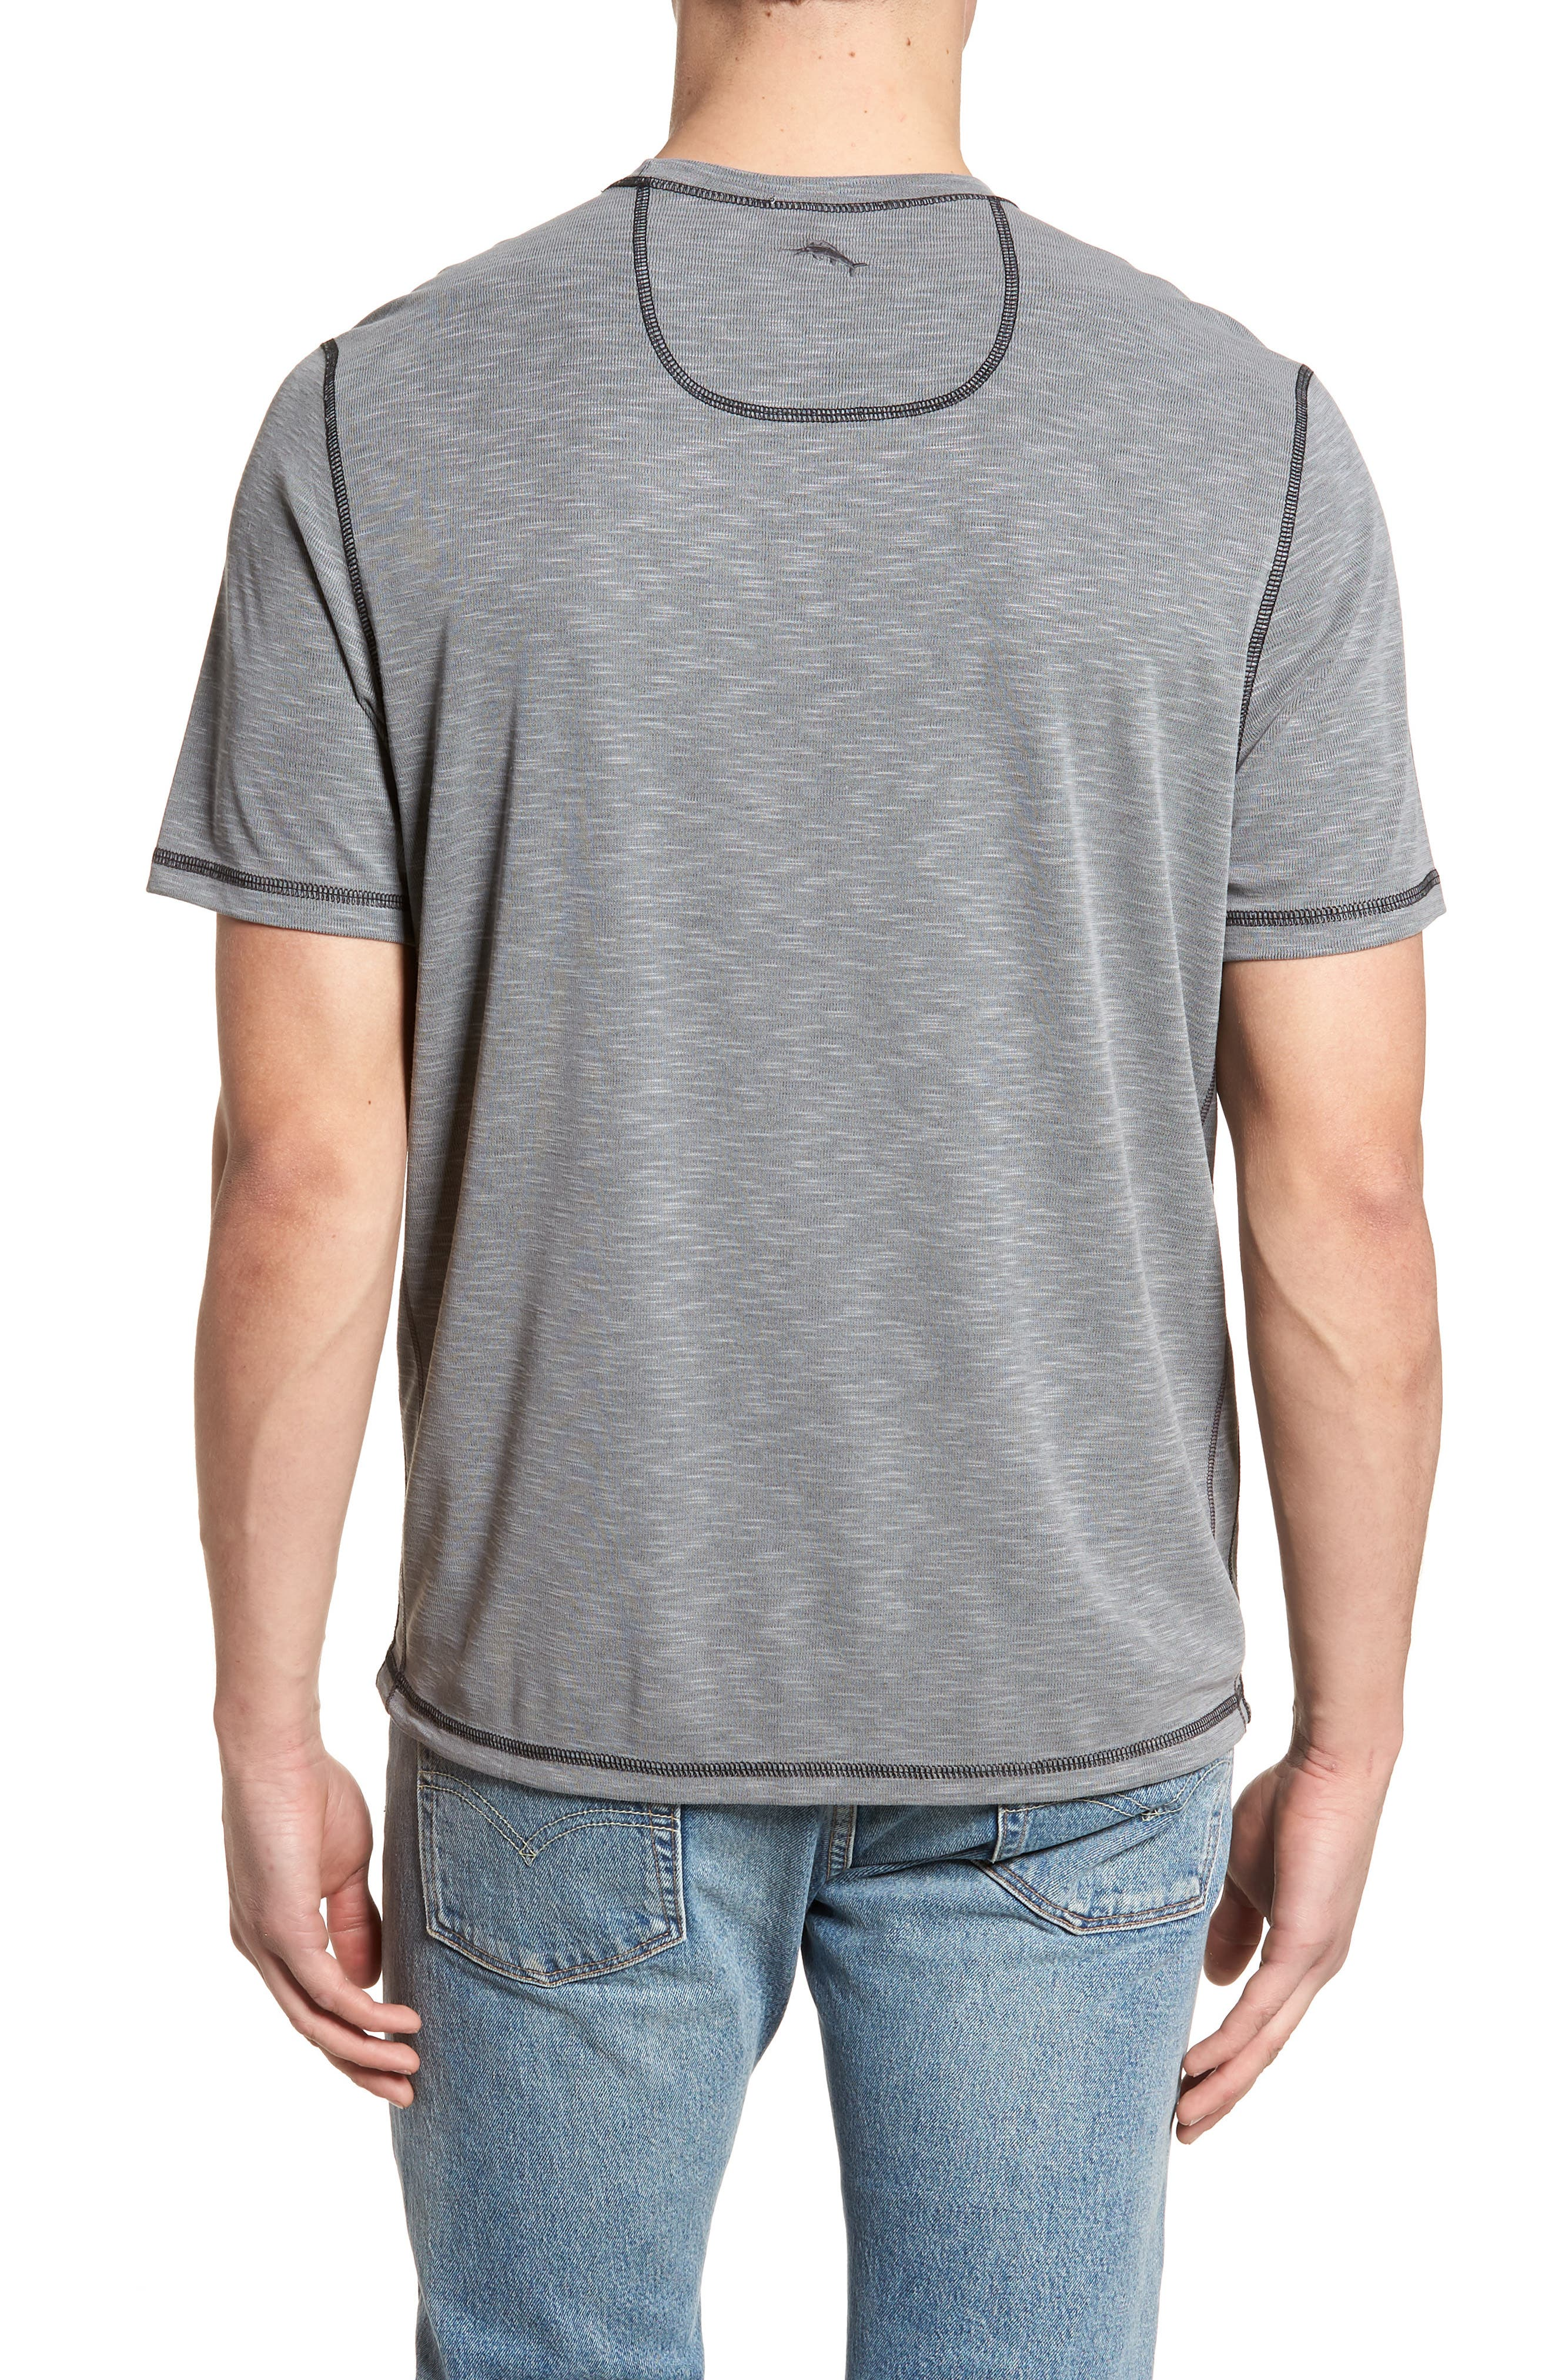 Flip Tide T-Shirt,                             Alternate thumbnail 2, color,                             COAL